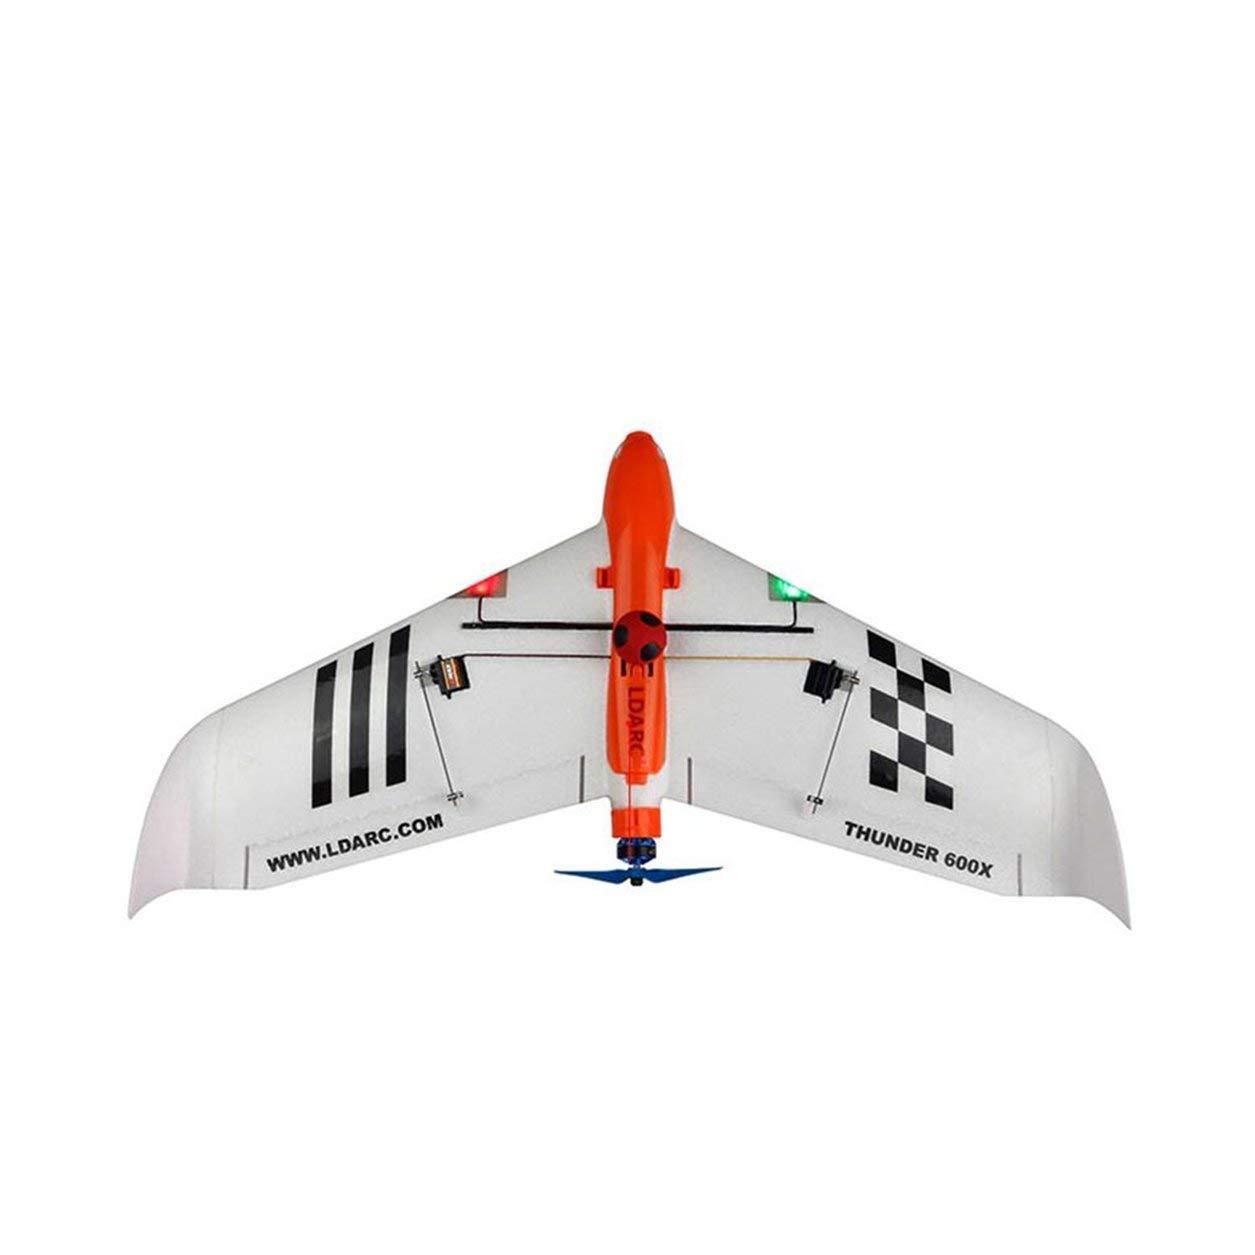 Dailyinshop Kingkong / LDARC Thunder 600X 656mm Leichte Spannweite EPO FPV RC Flugzeug Kit